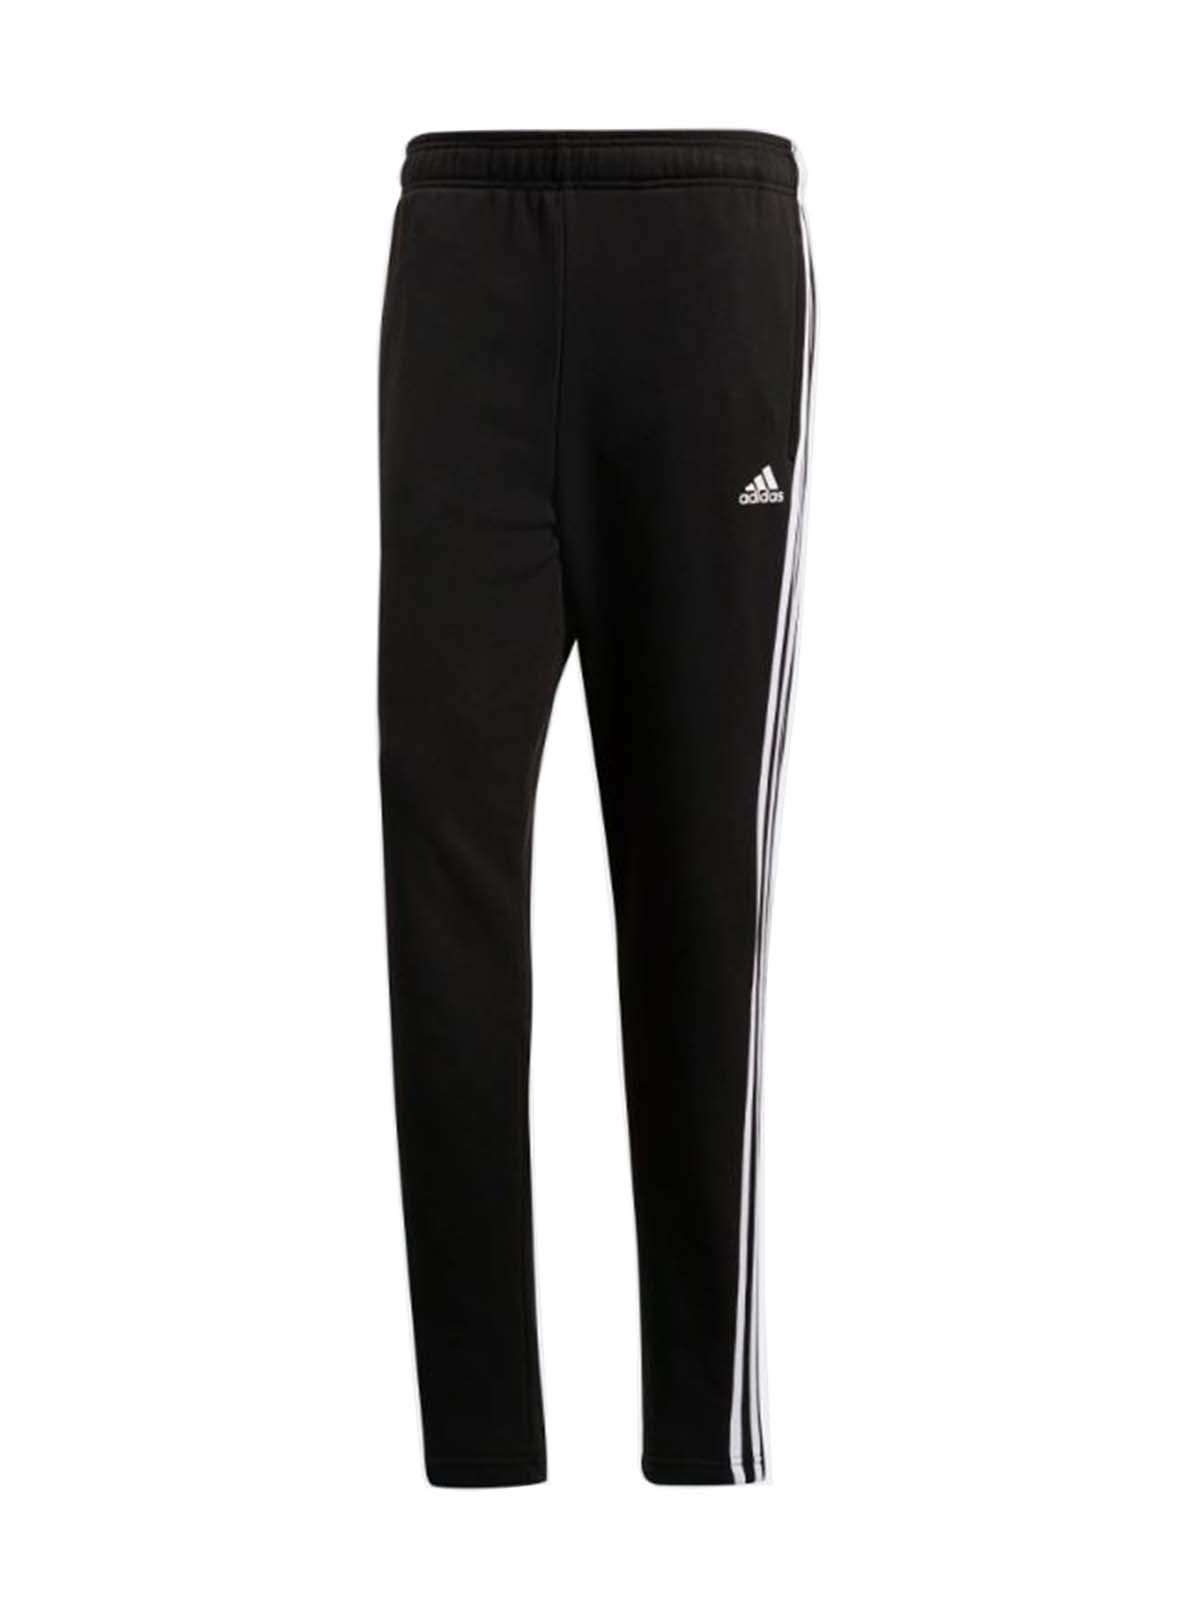 Adidas גברים // Essentials 3-Stripes Pants Black